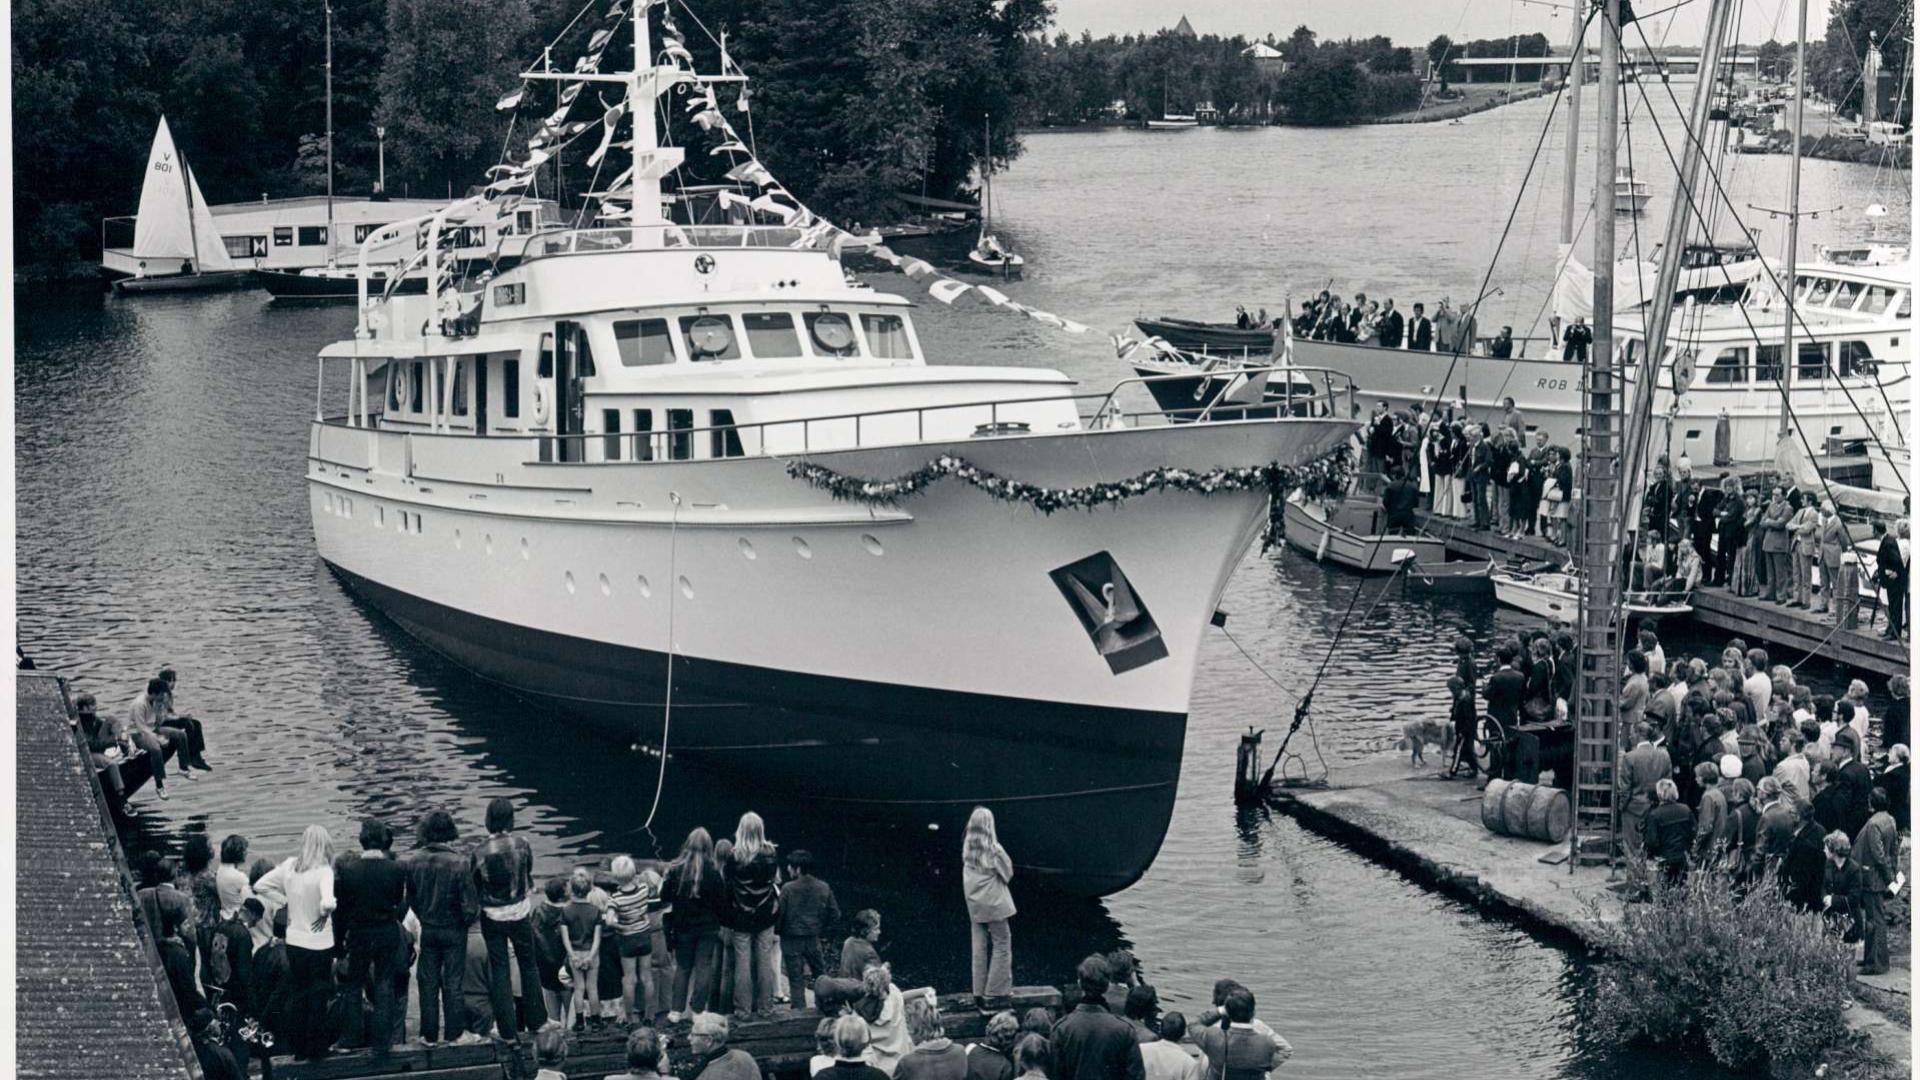 tip-top-iii-motor-yacht-feadship-1972-35m-dock